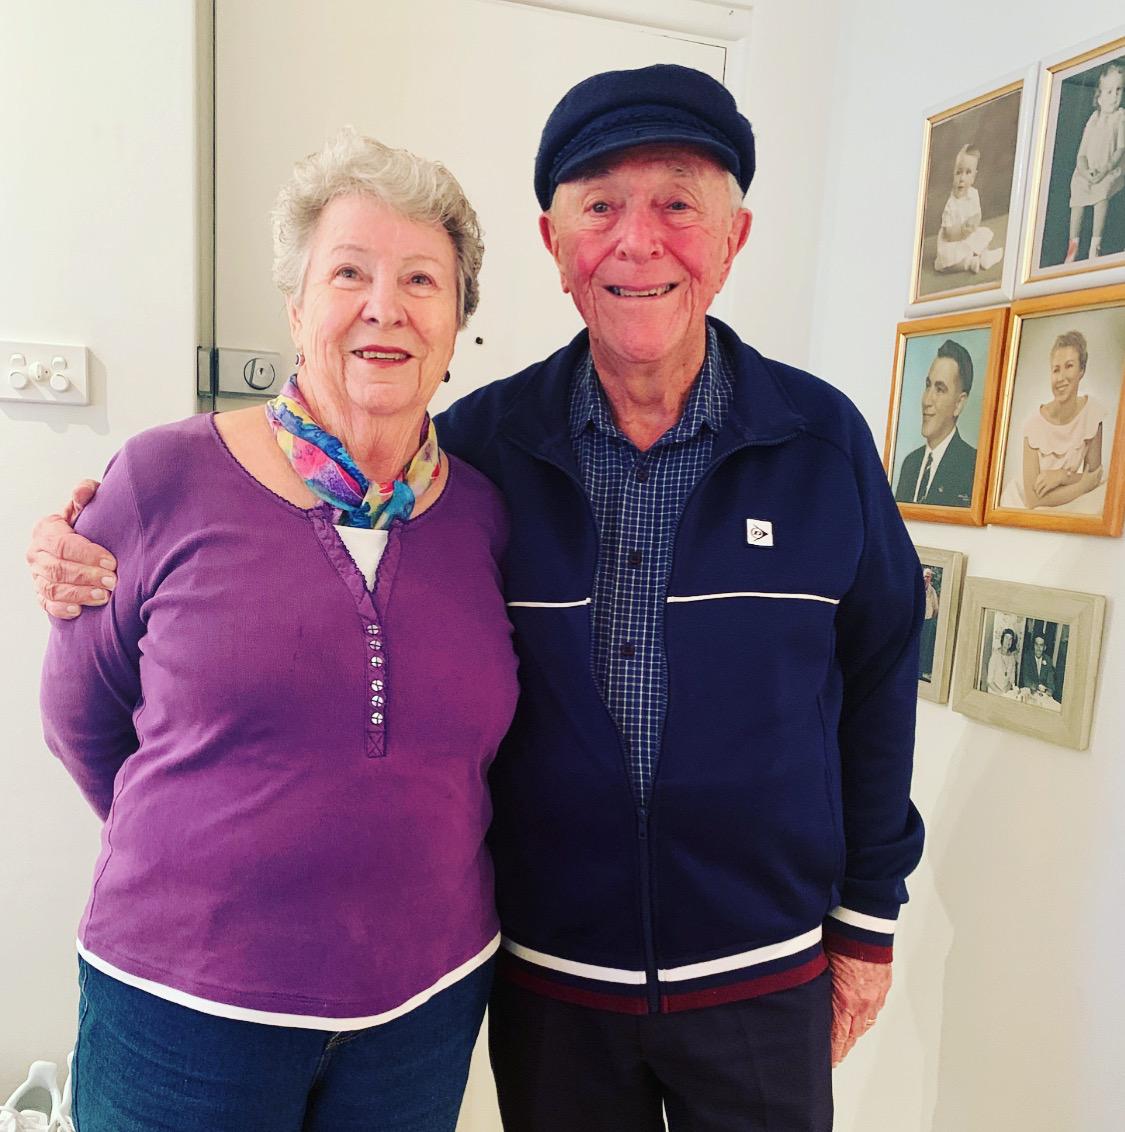 Jim & Marilyn Kime